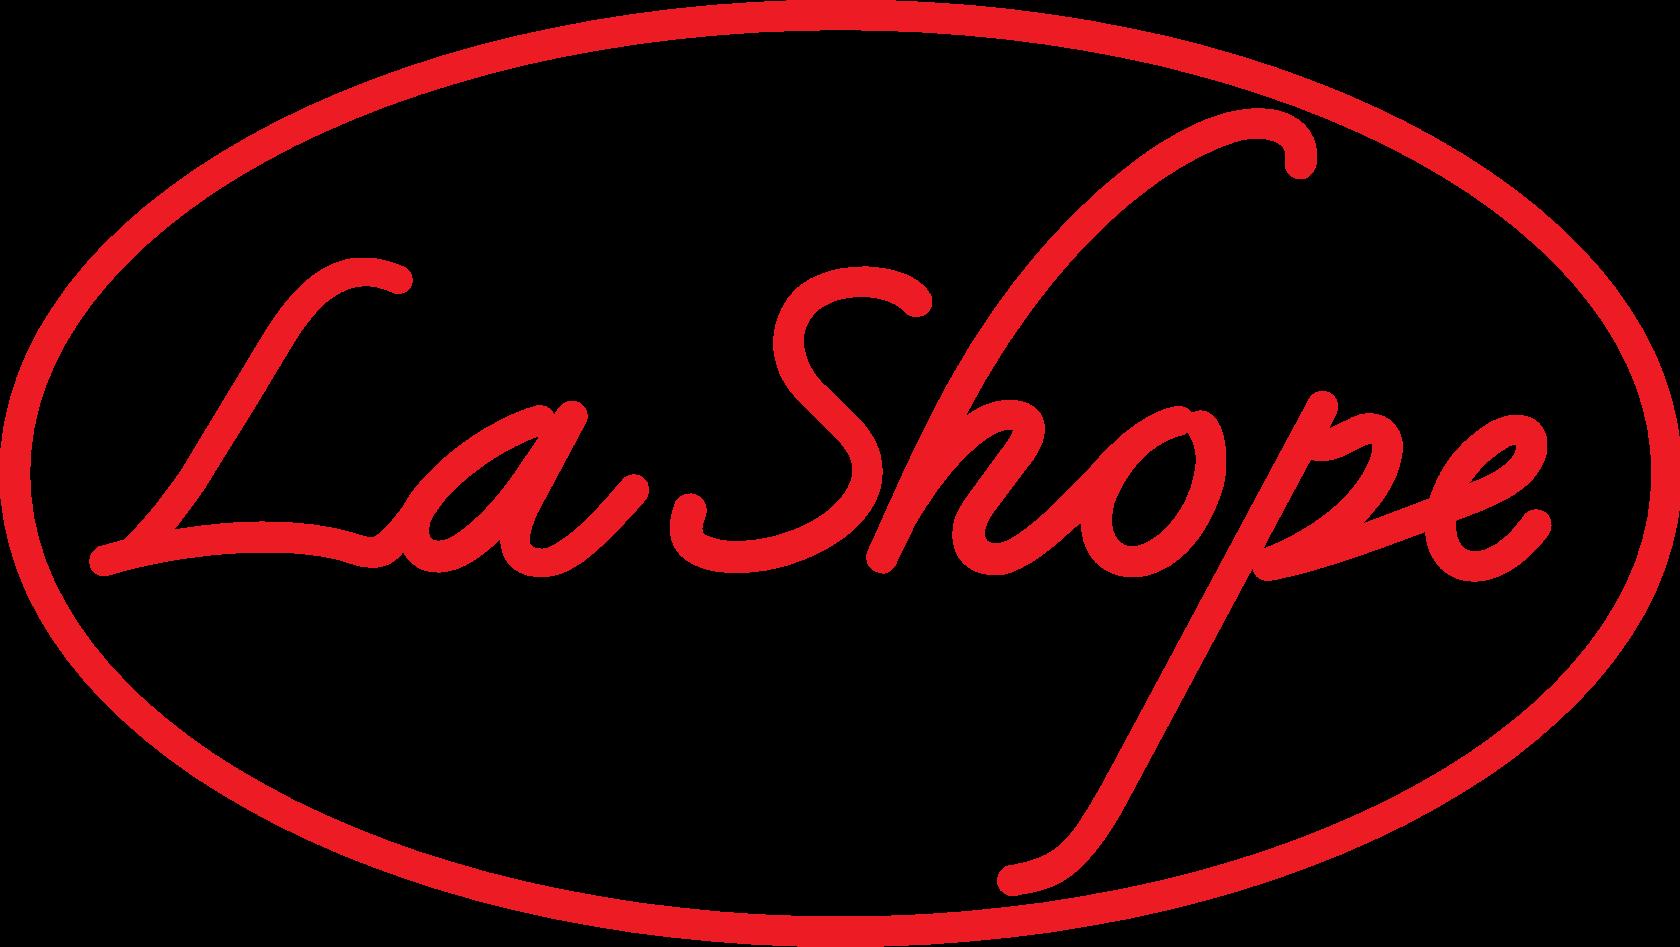 La Shope